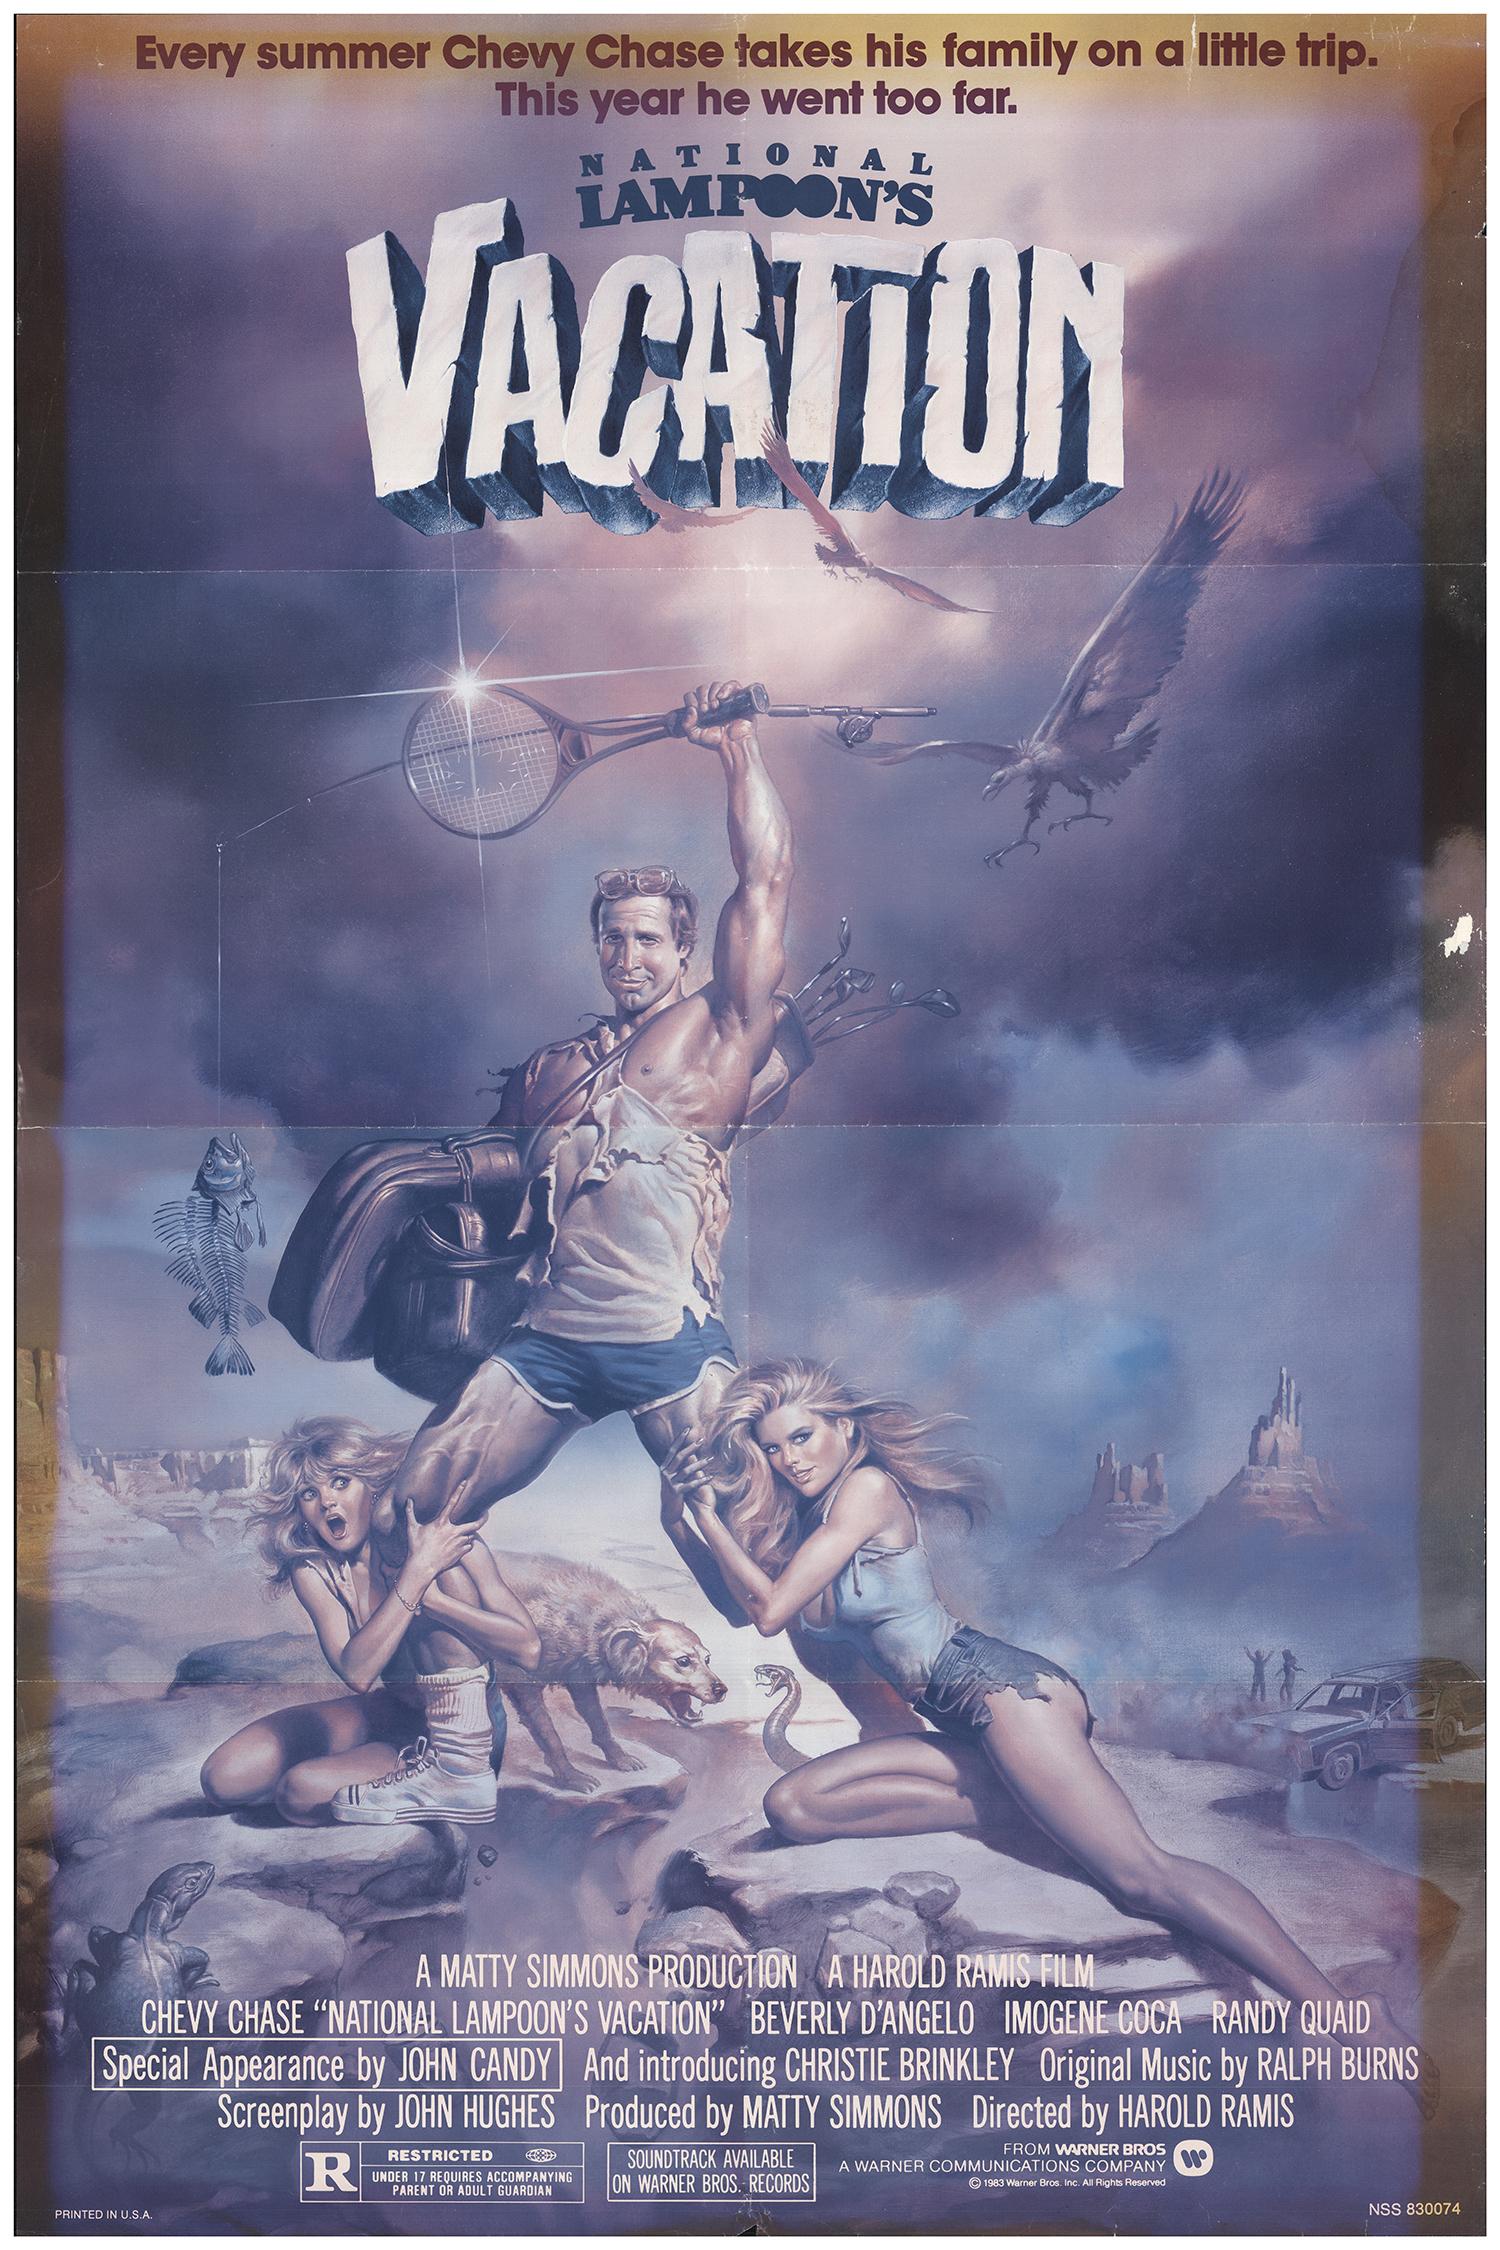 National Lampoon S Vacation 1983 Original Movie Poster Fff 70999 Fffmovieposters Com